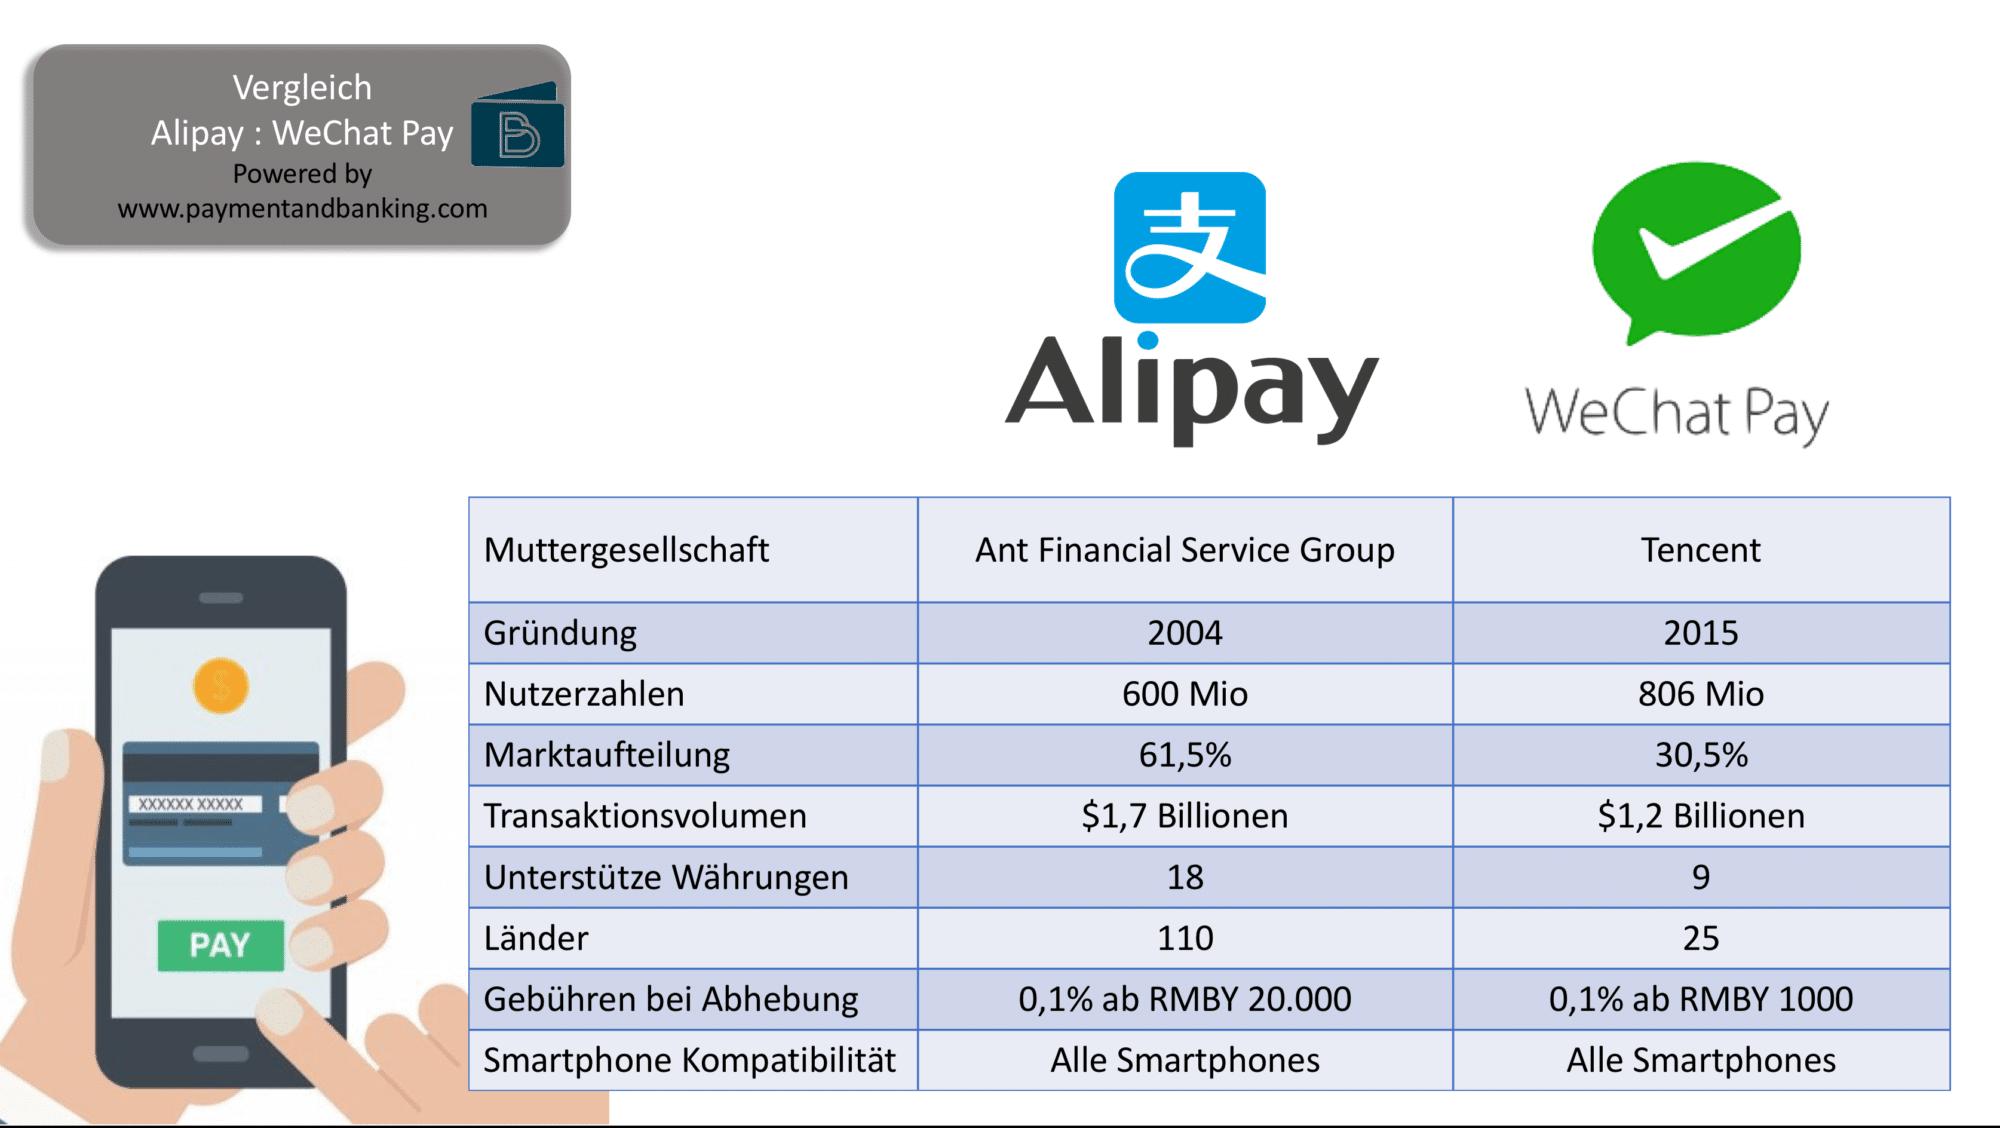 Der Vergleich zweier Tech-Giganten -Alipay vs. WeChat